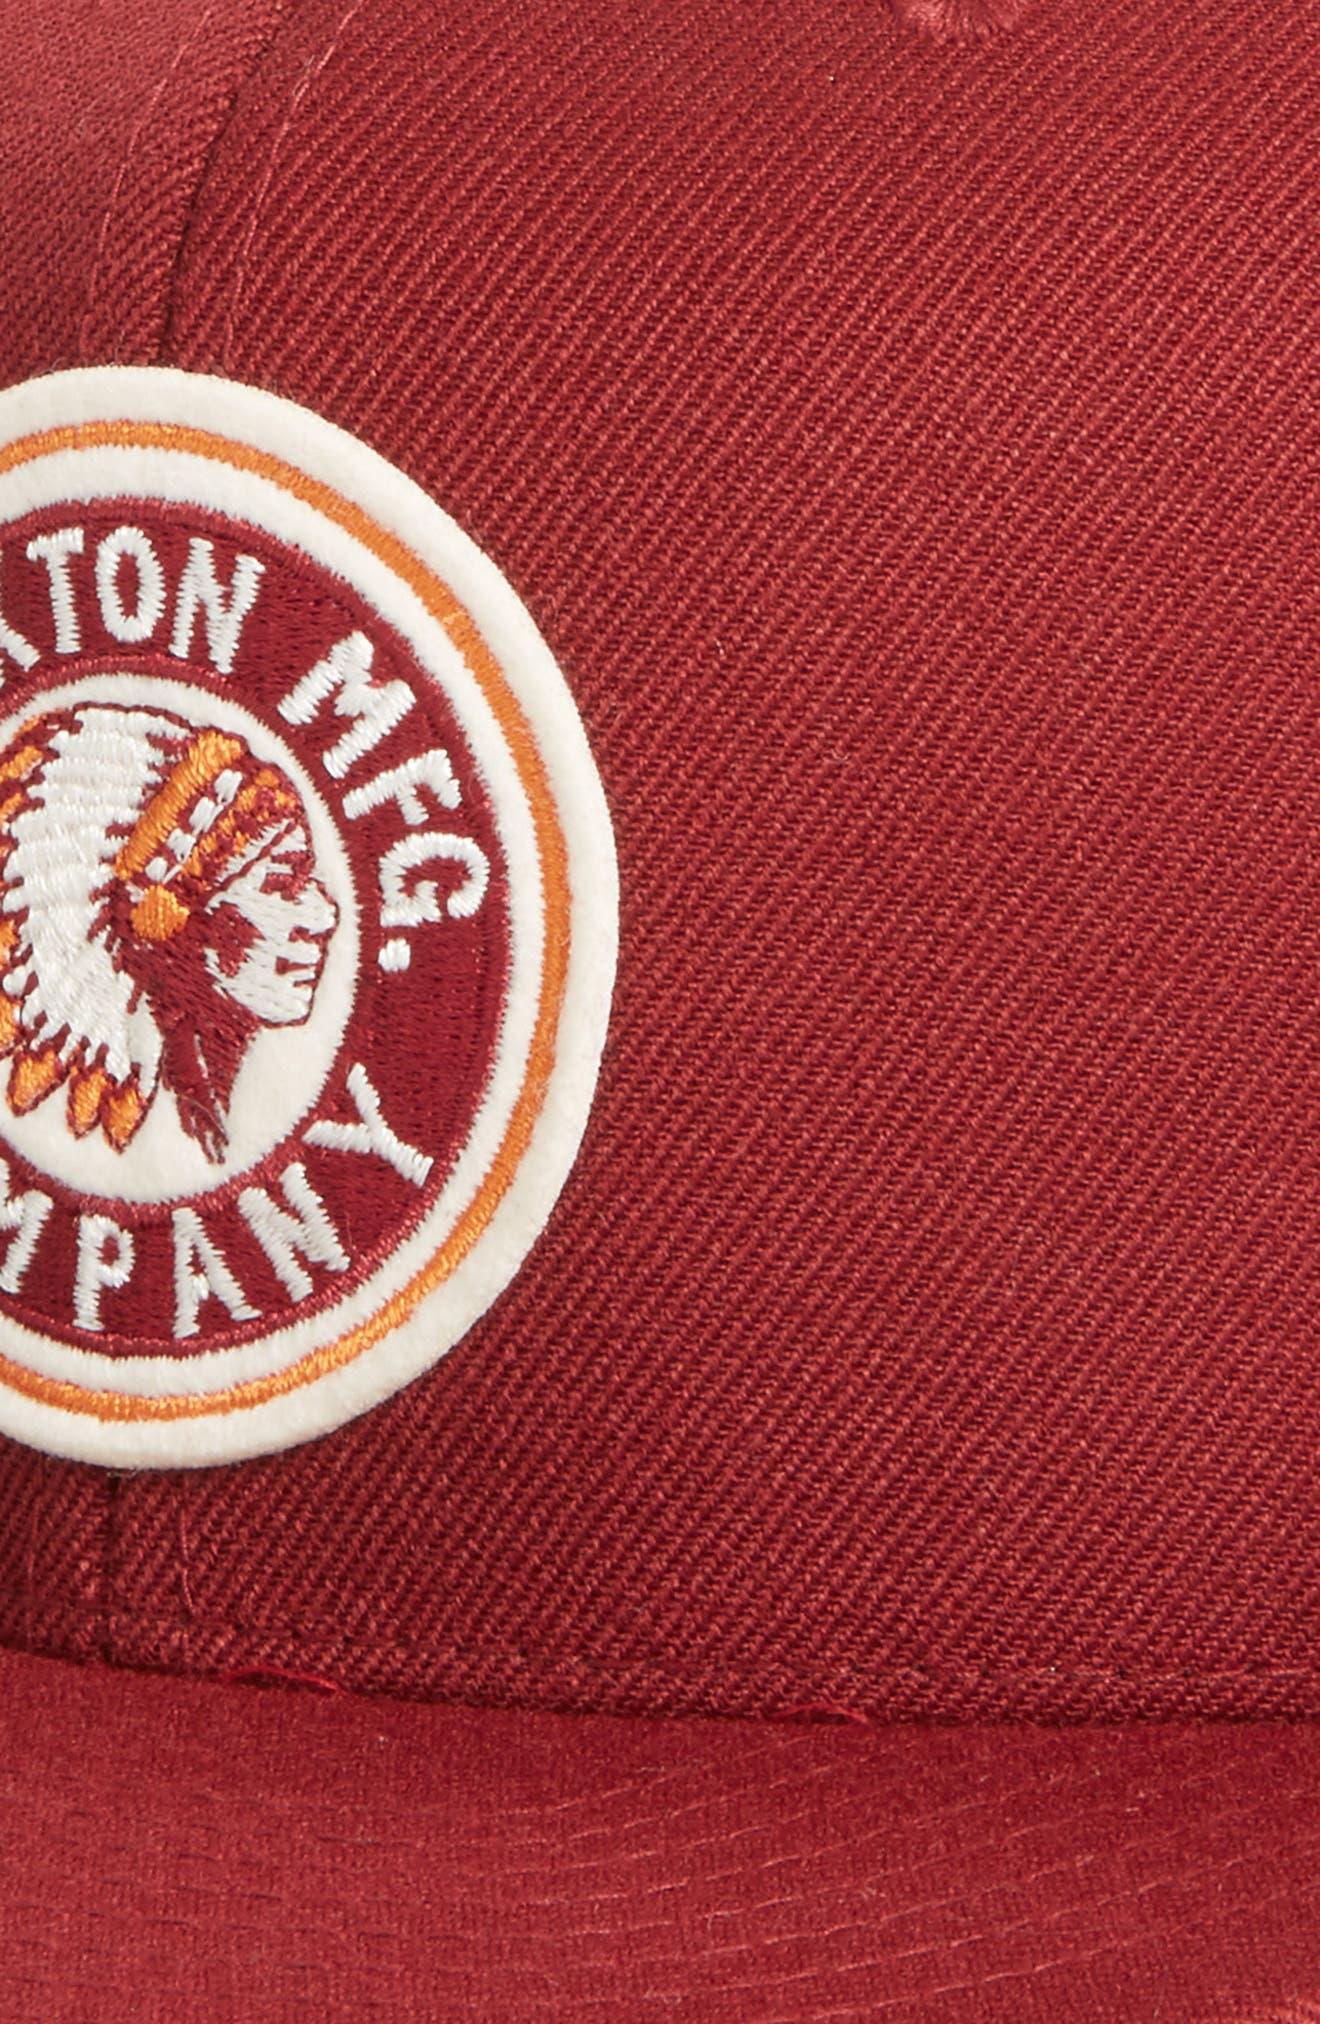 Alternate Image 3  - Brixton 'Rival' Snapback Baseball Cap